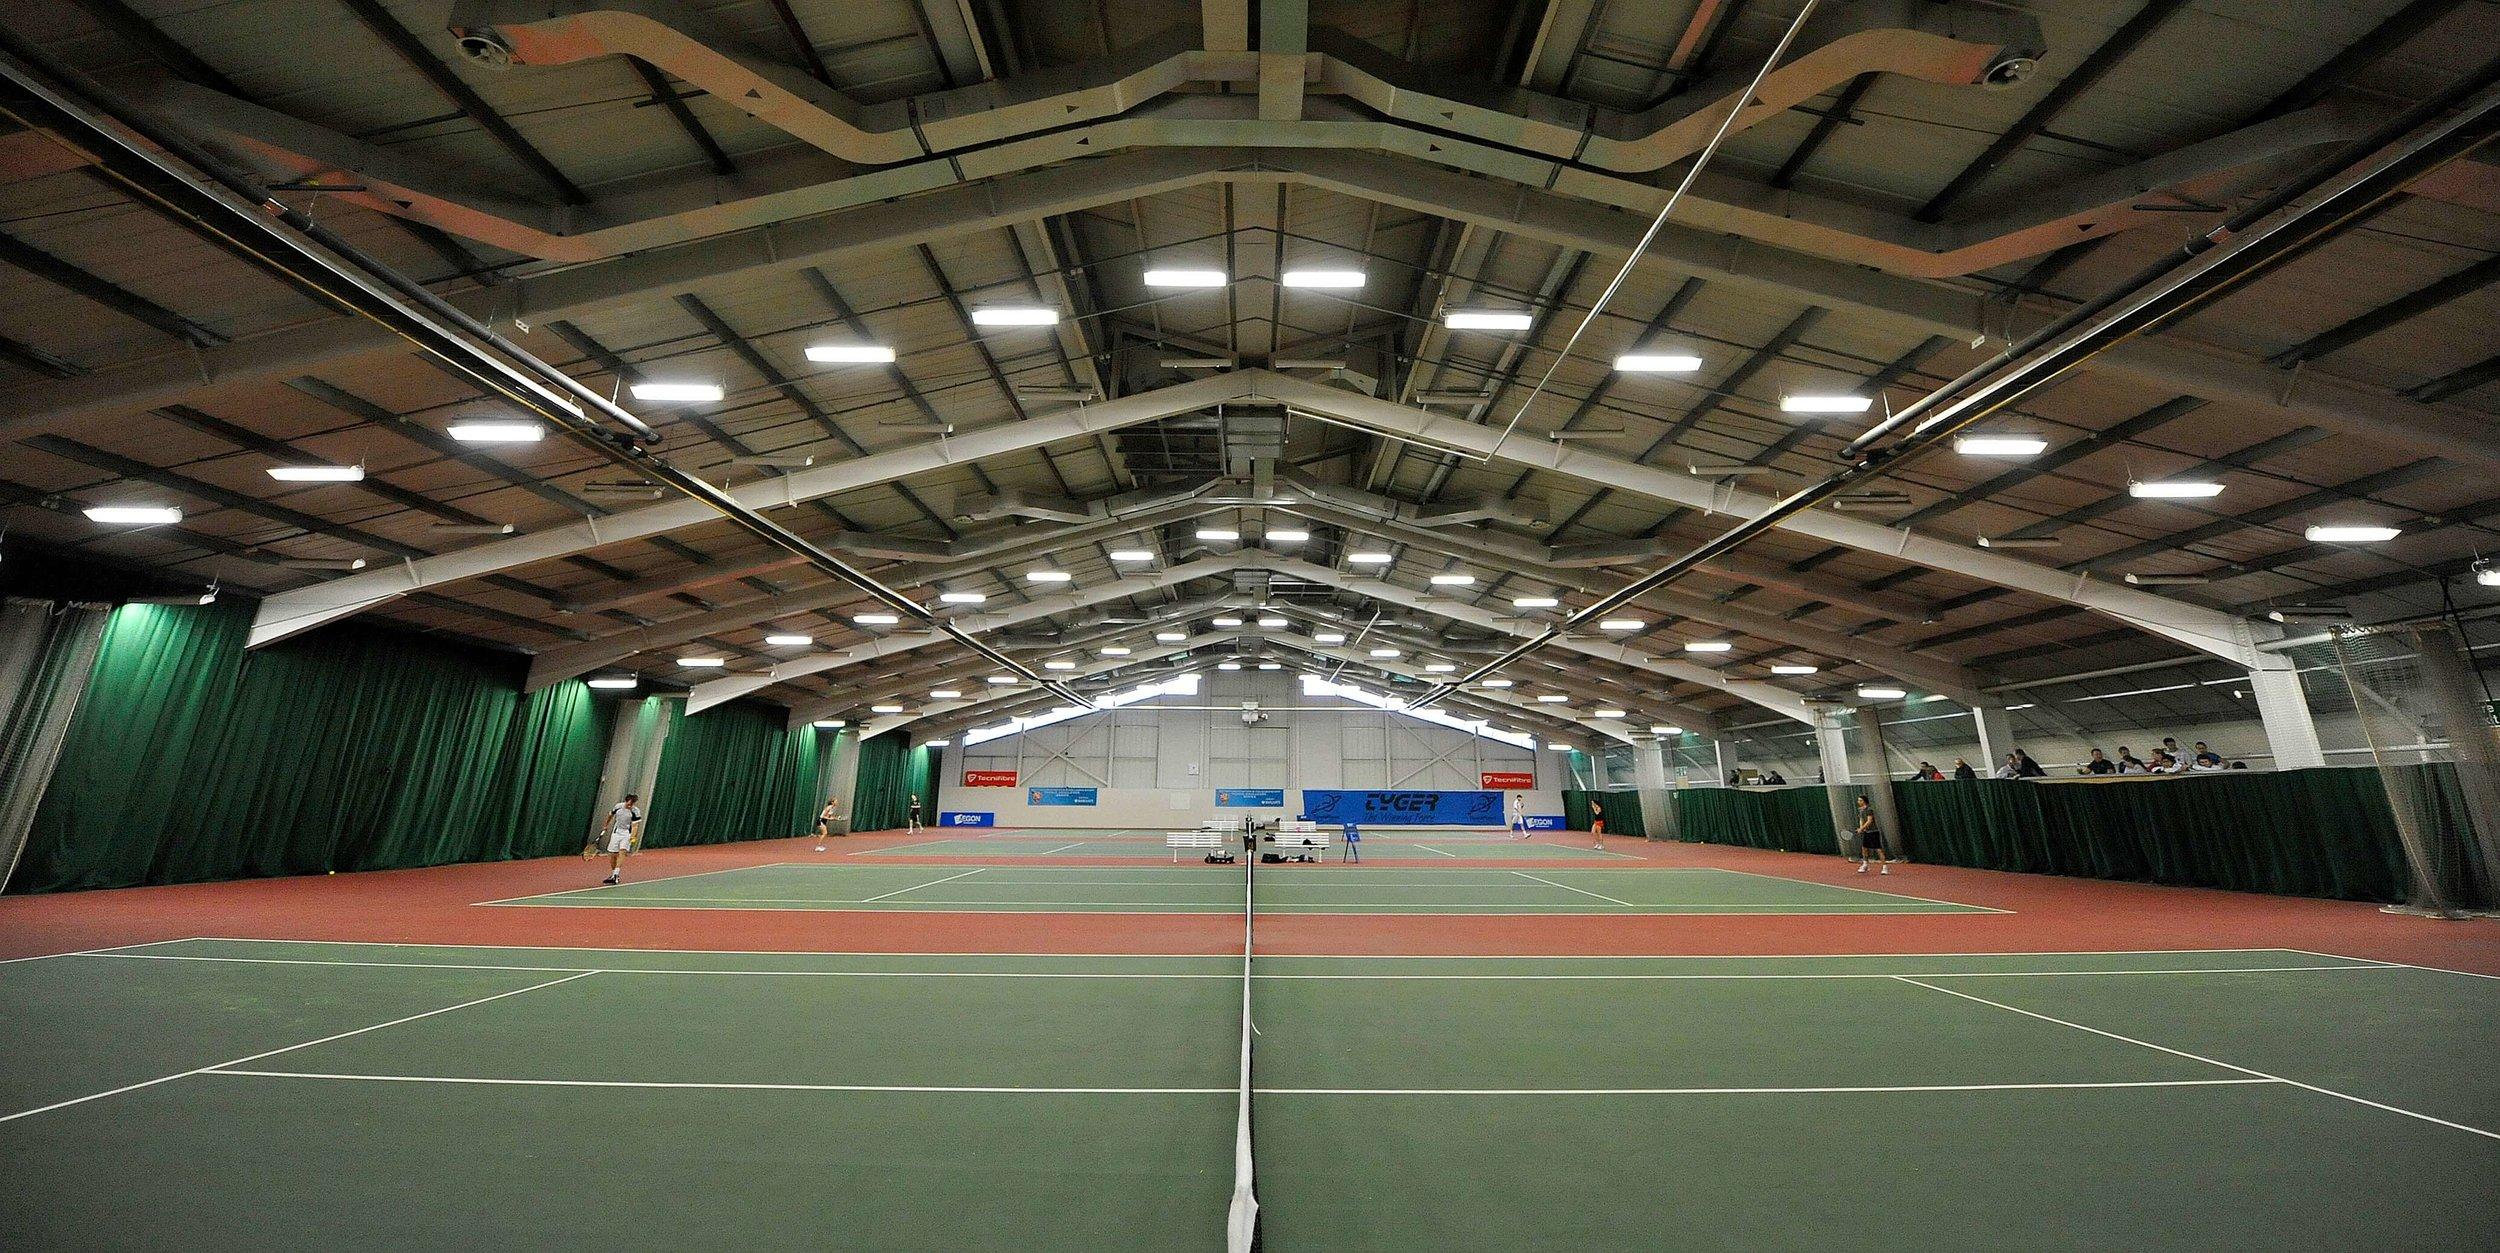 hires tennis venue (9).JPG